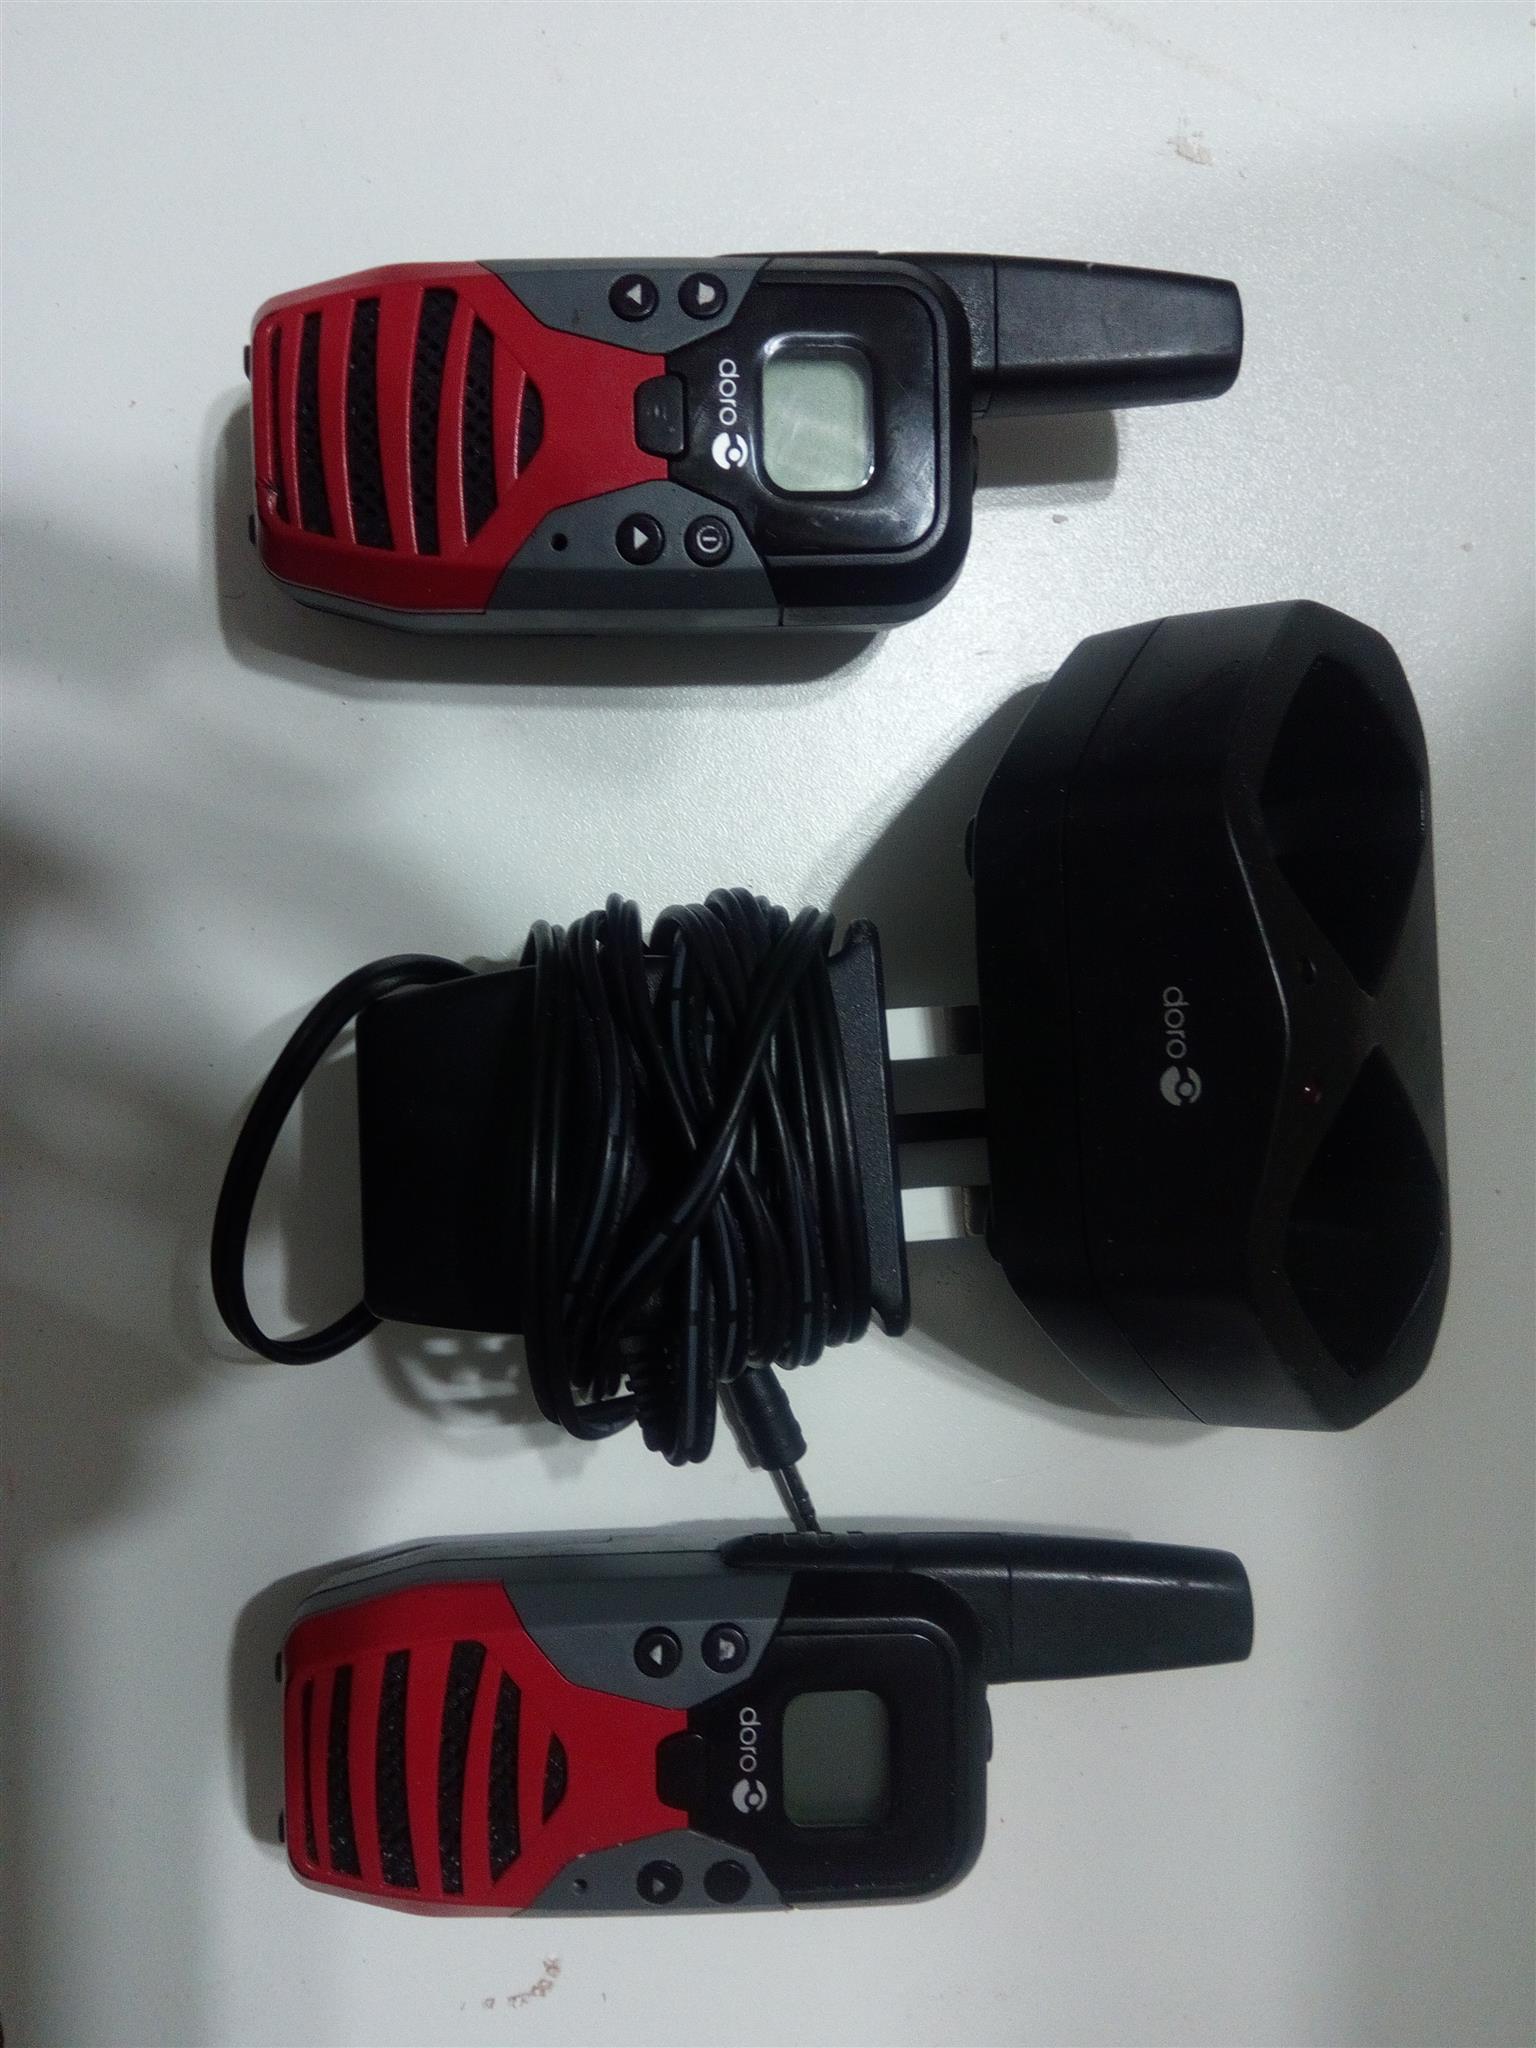 Entel 2way radios heavy duty buisness use